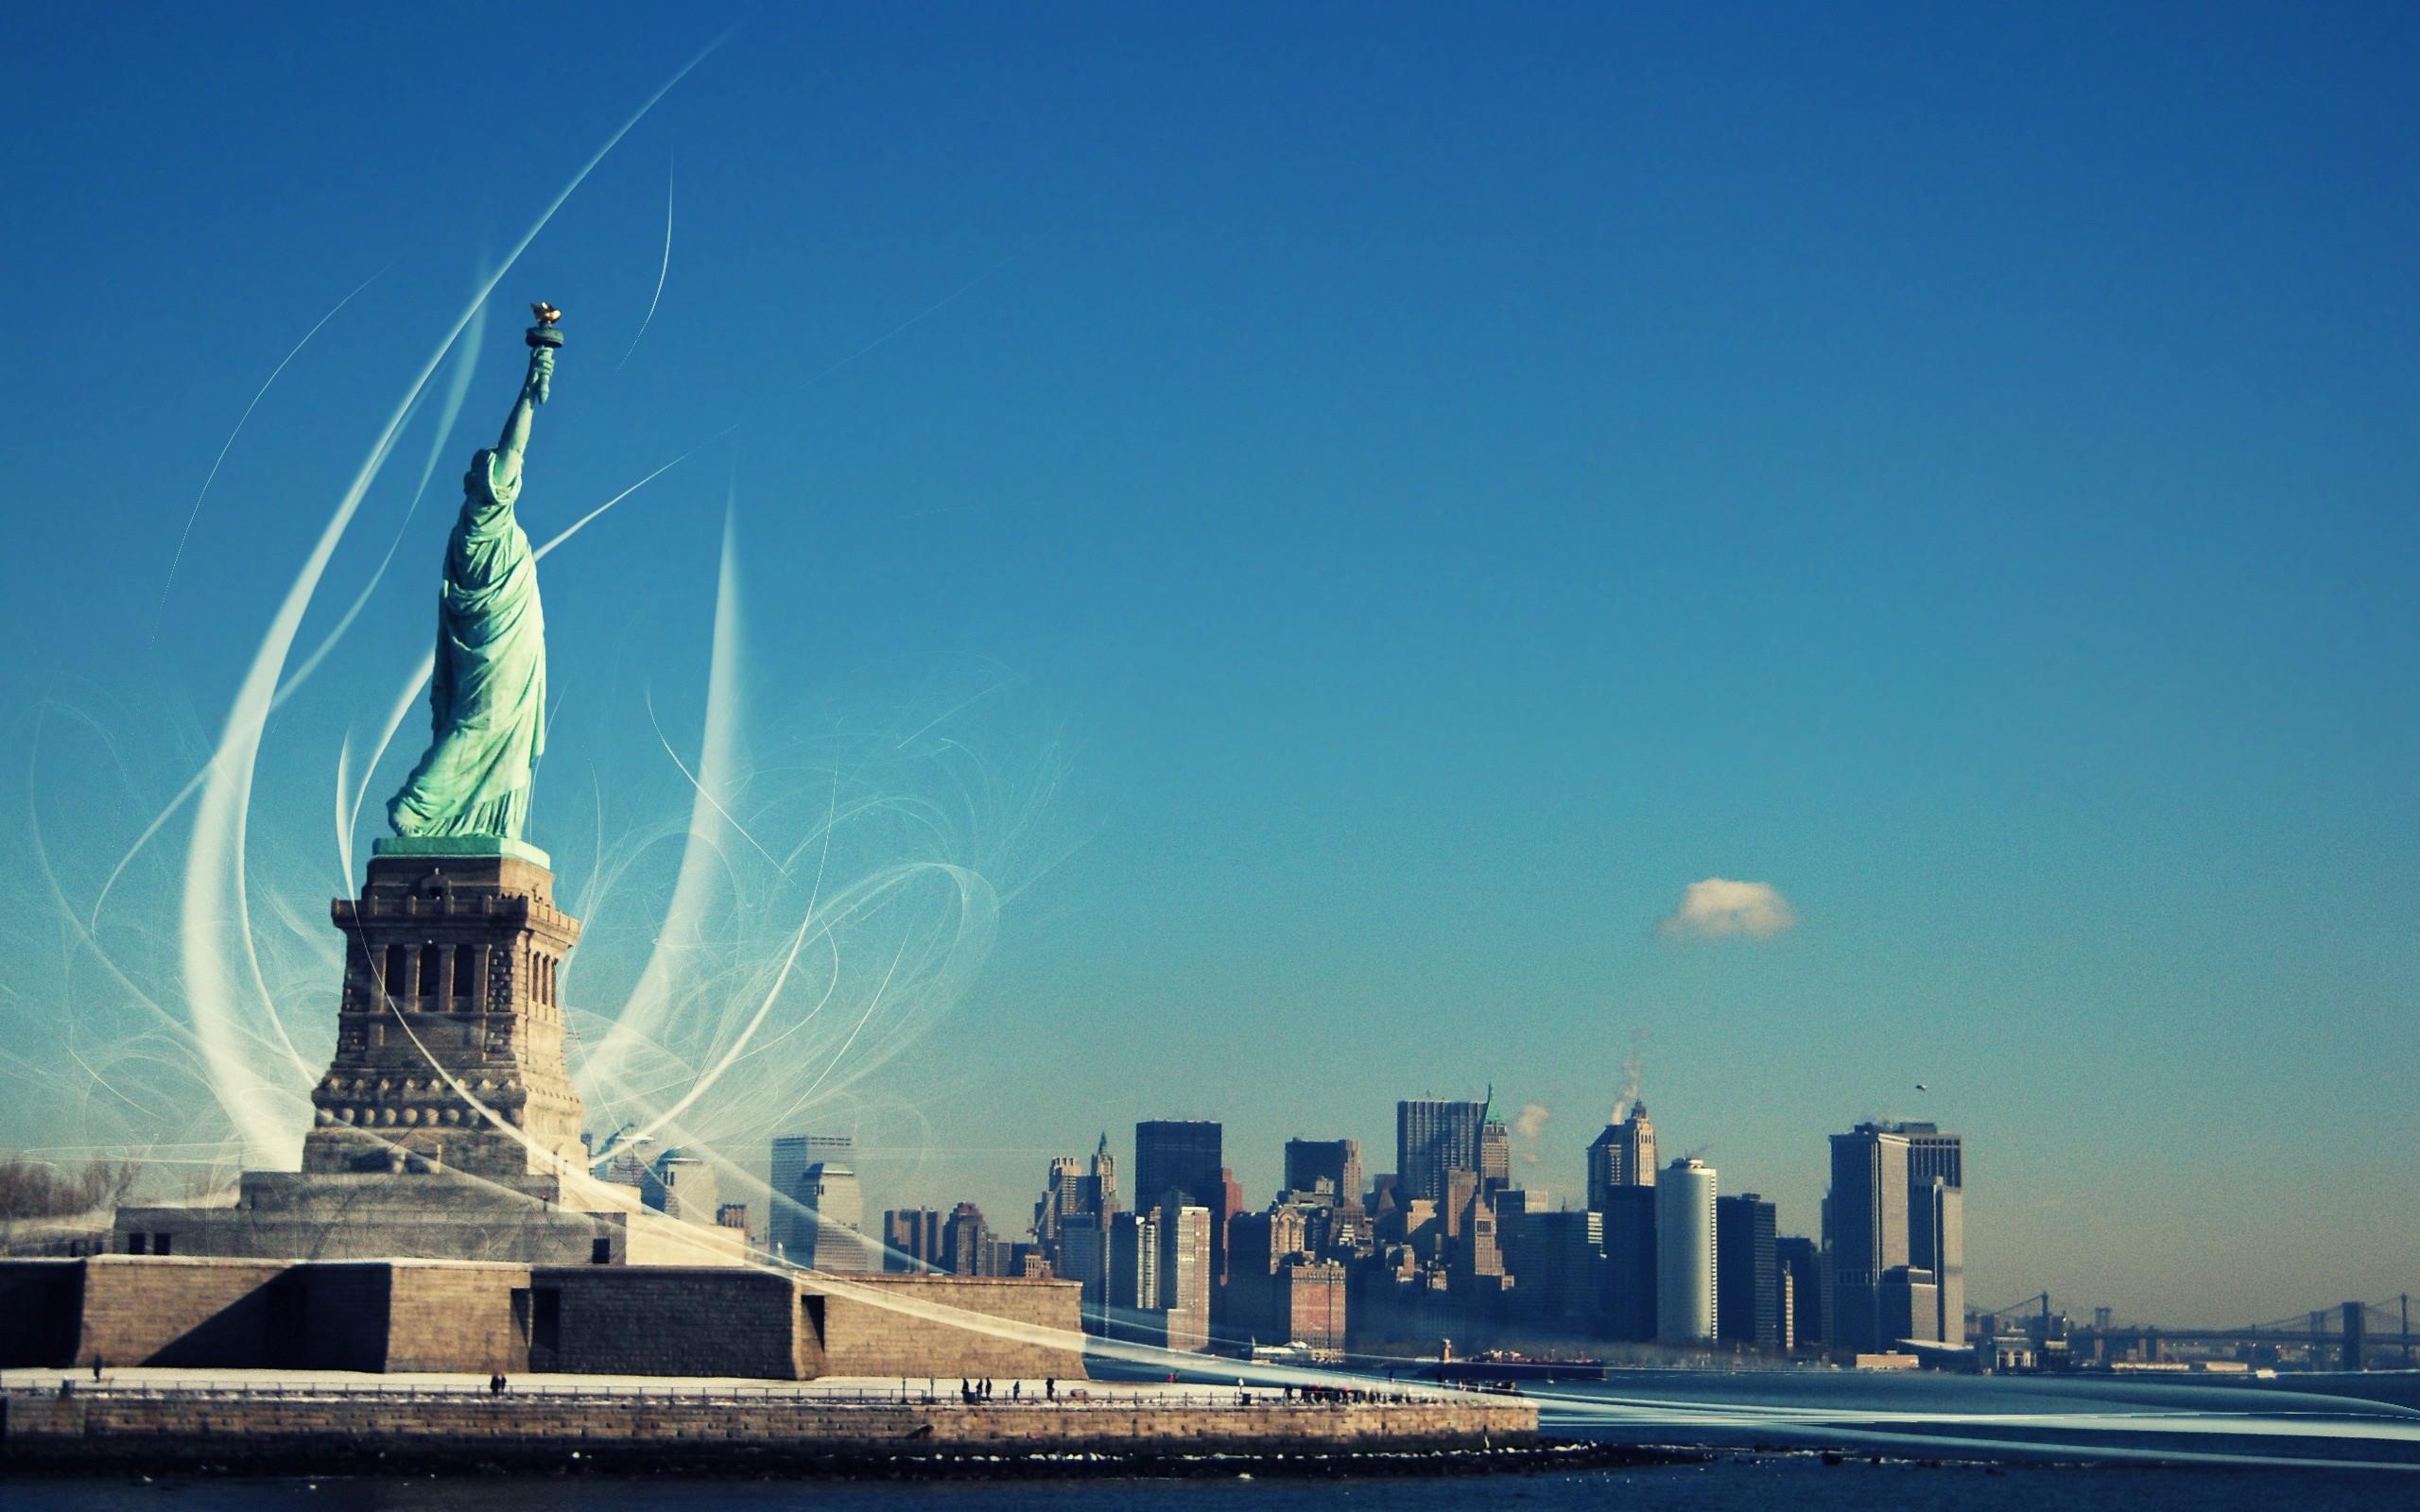 Free New York City Statue of Liberty USA America HD Desktop wallpapers  backgrounds wall murals downloads